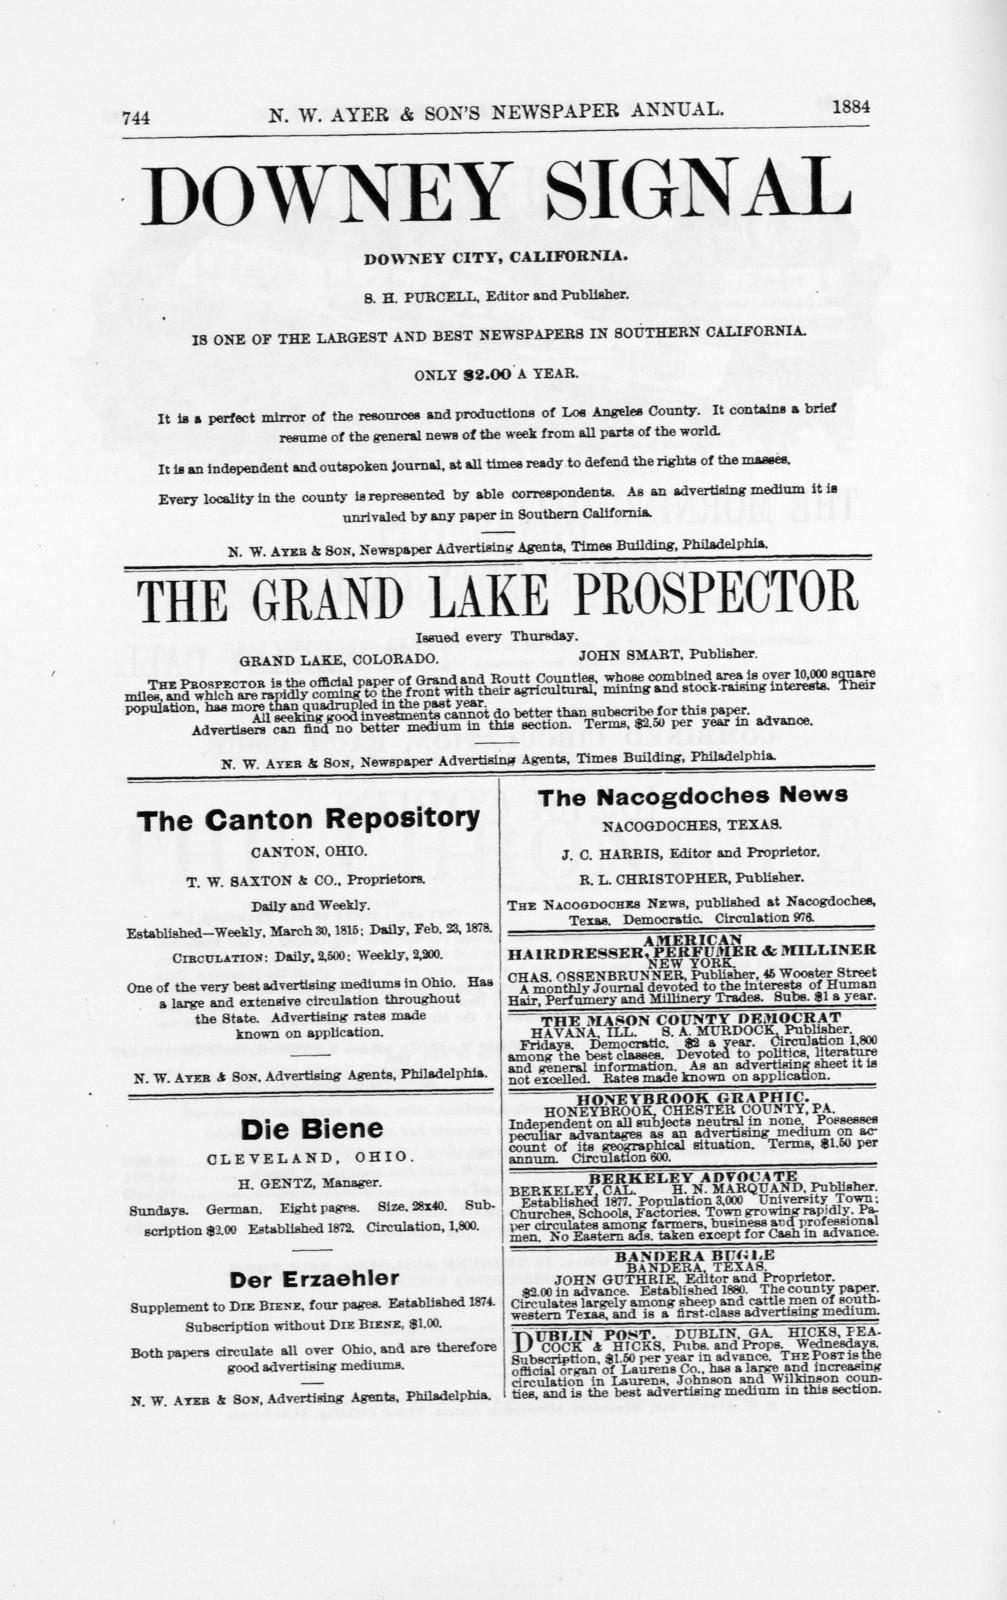 N.W. Ayer & Son's American newspaper annual 1893